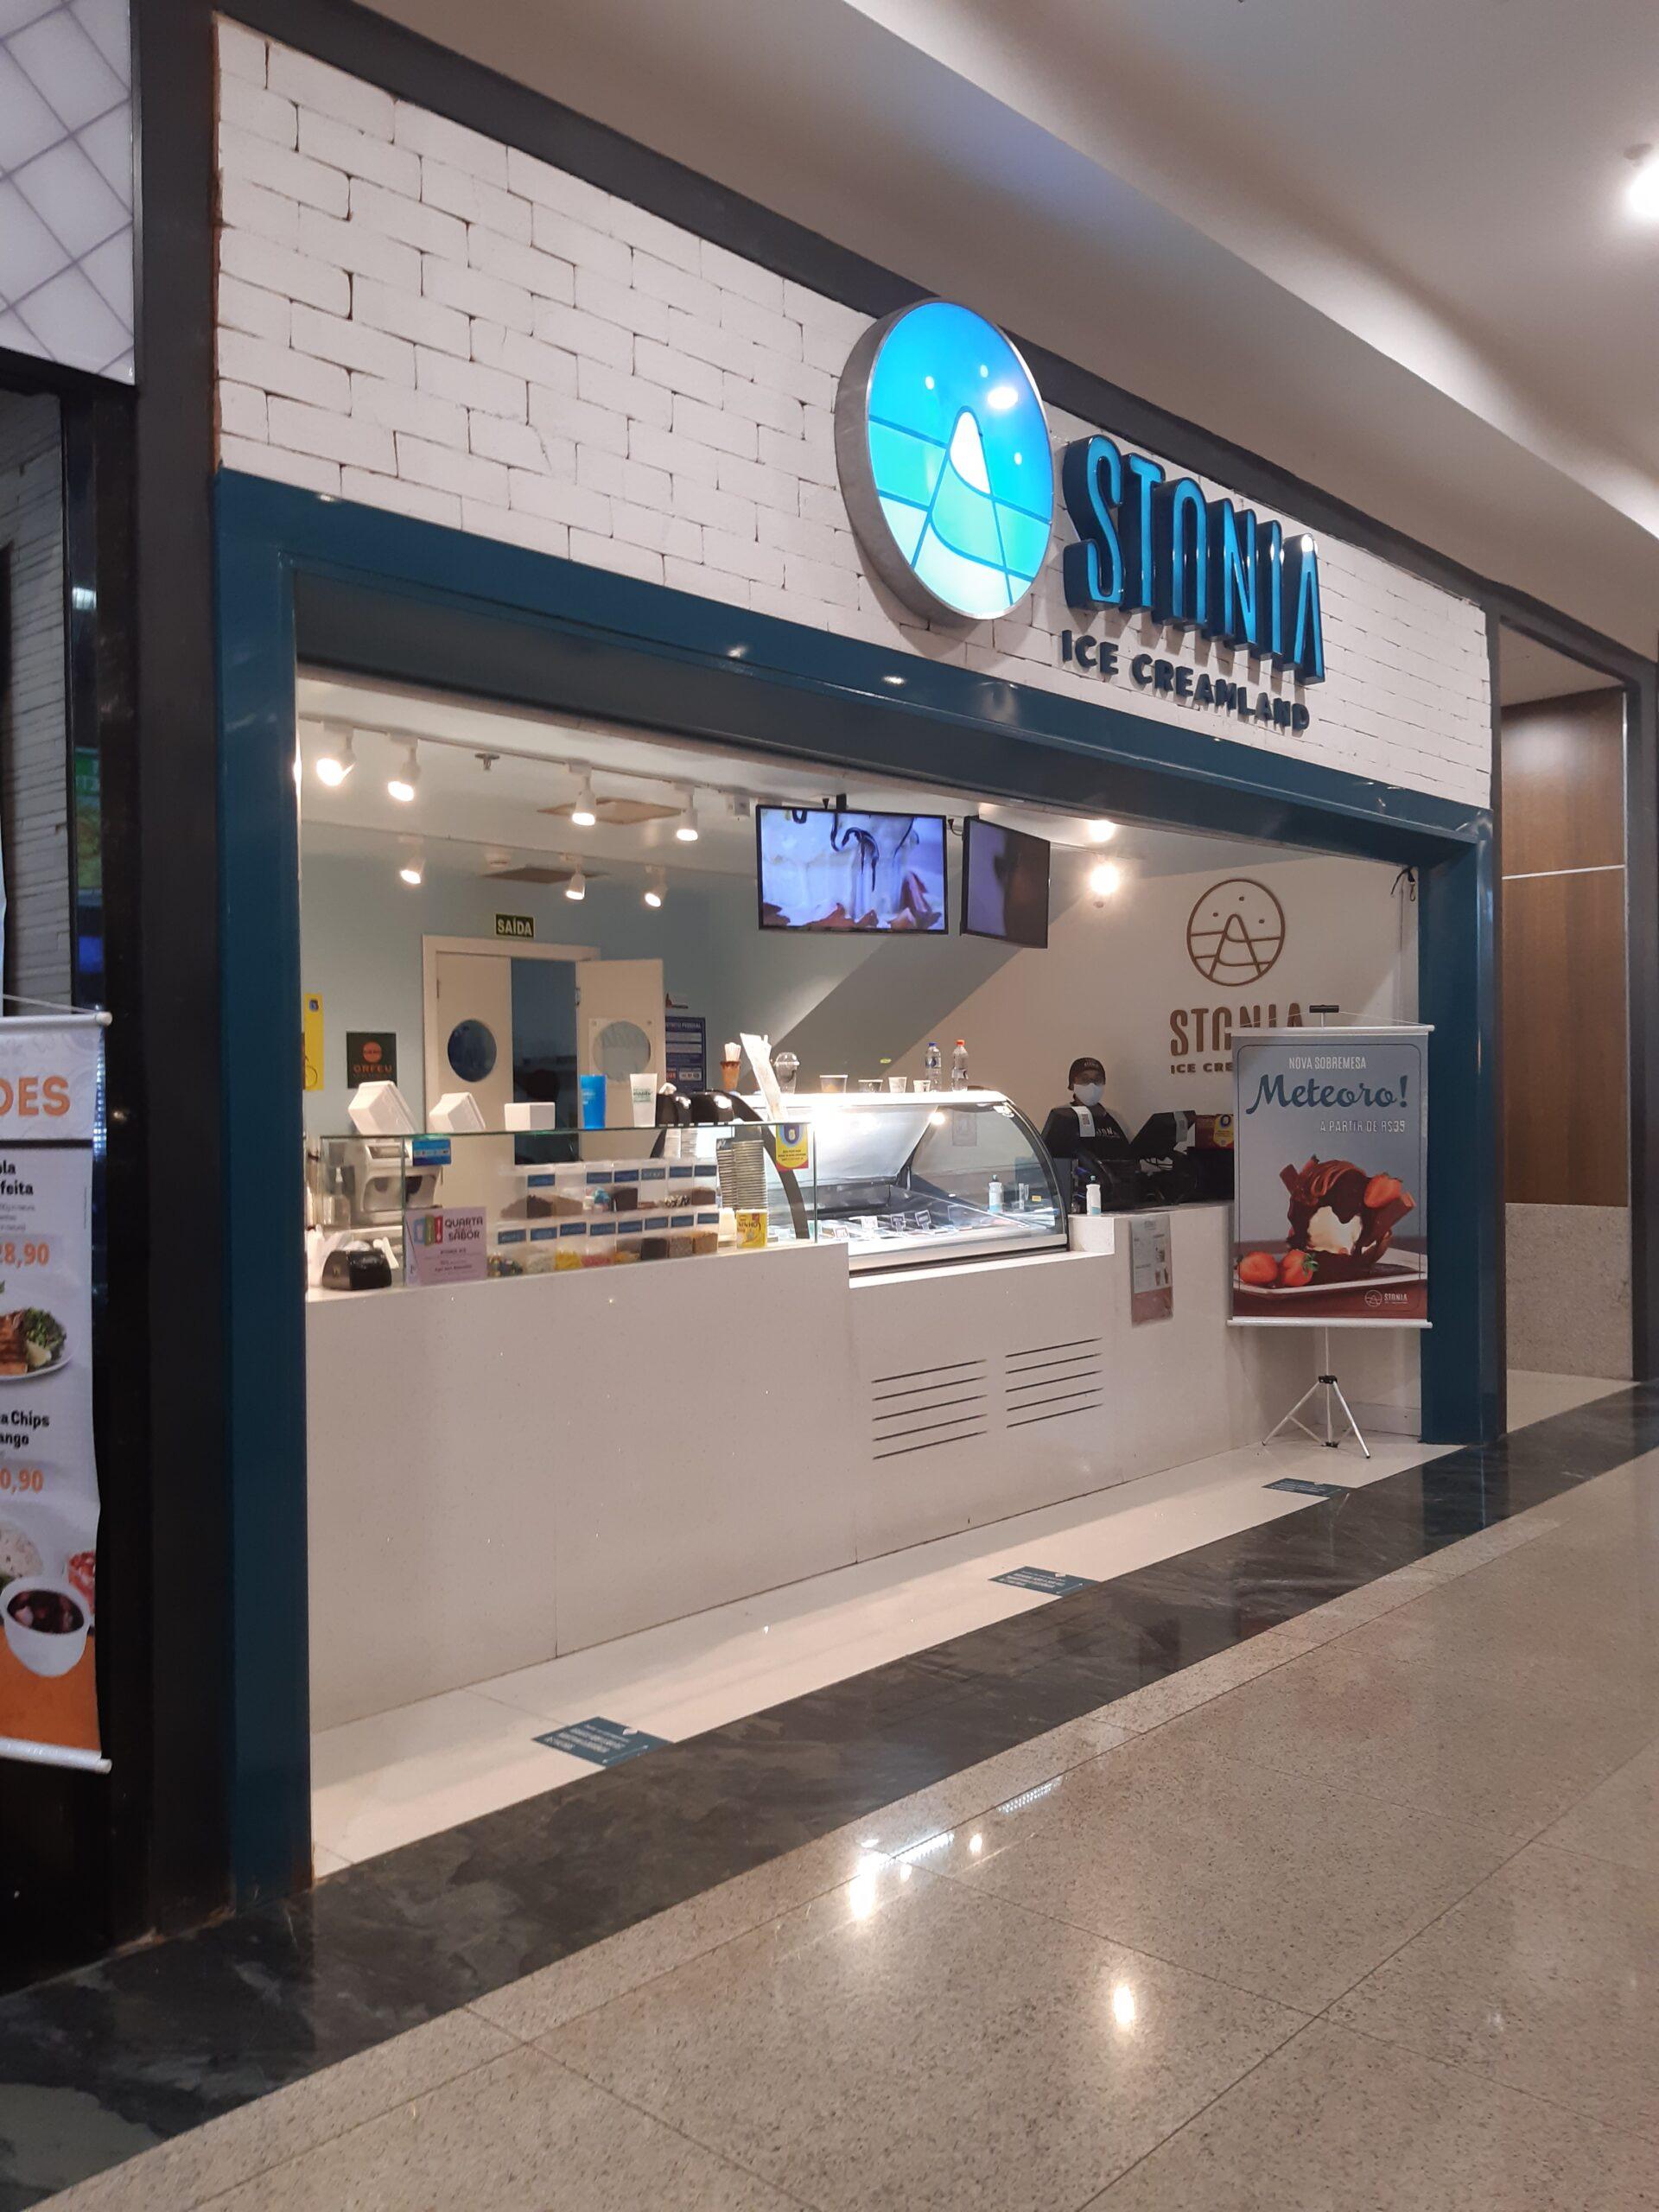 Stonia Ice Cream do Taguatinga Shopping, Comércio Brasilia